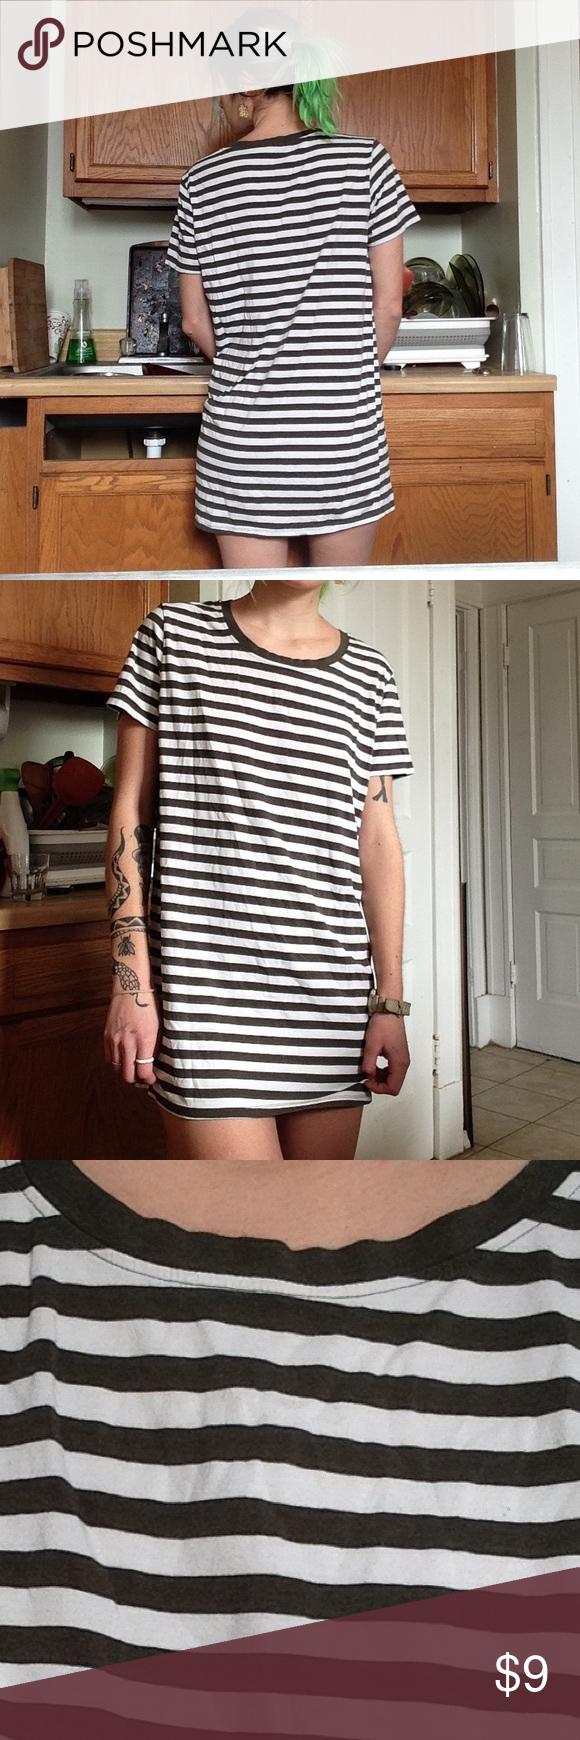 Stripe t shirt dress urban outfitters dress urban uutfitters